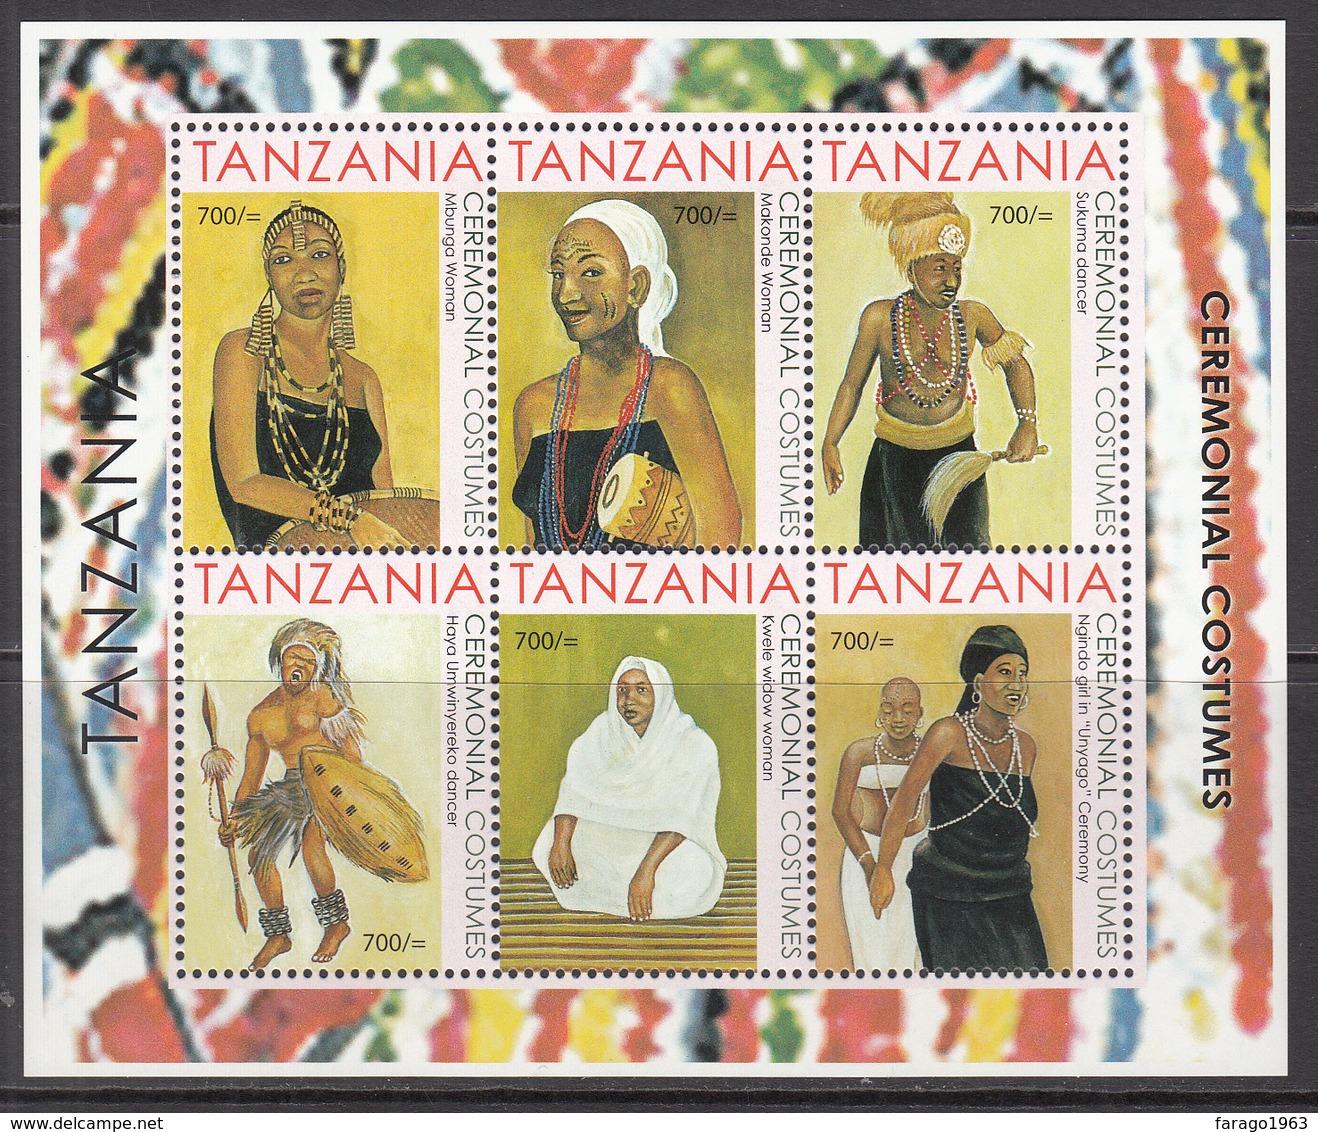 2013 Tanzania Ceremonial Costumes Culture Complete Set Of 2 Souvenir Sheets MNH - Tansania (1964-...)